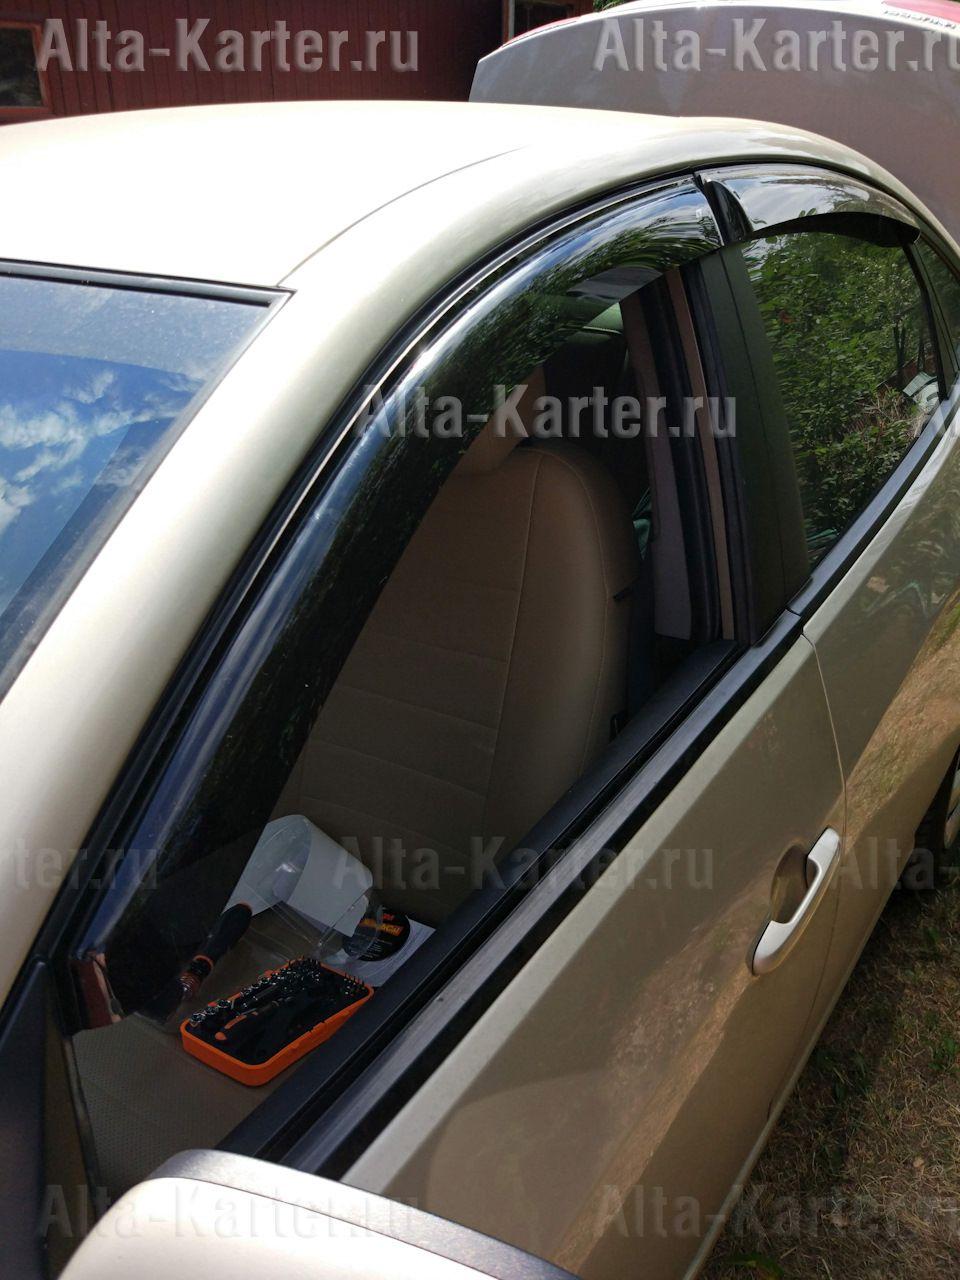 Дефлекторы Cobra Tuning для окон Hyundai Elantra IV седан 2006-2011. Артикул H20307